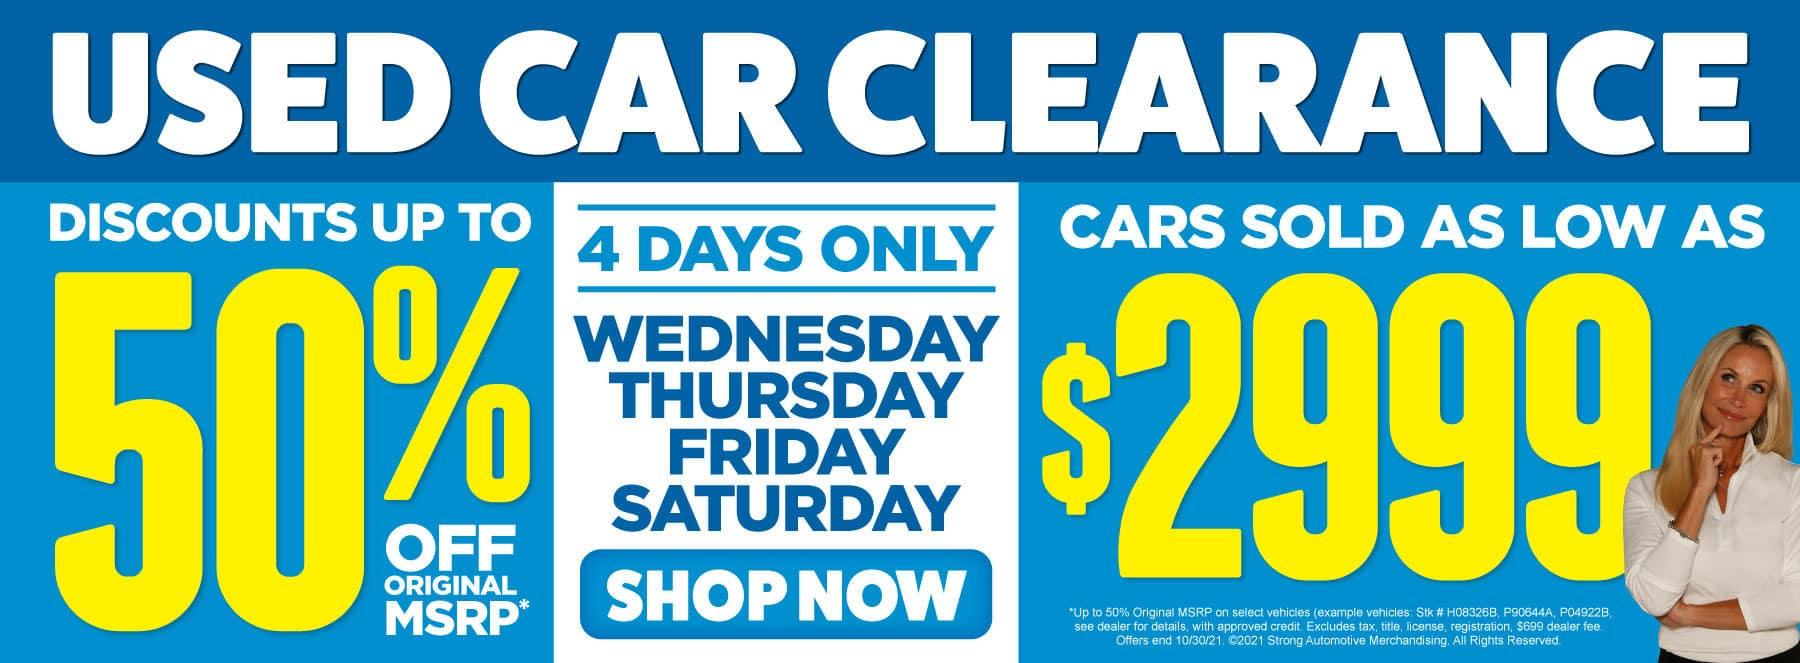 Used Car Clearance